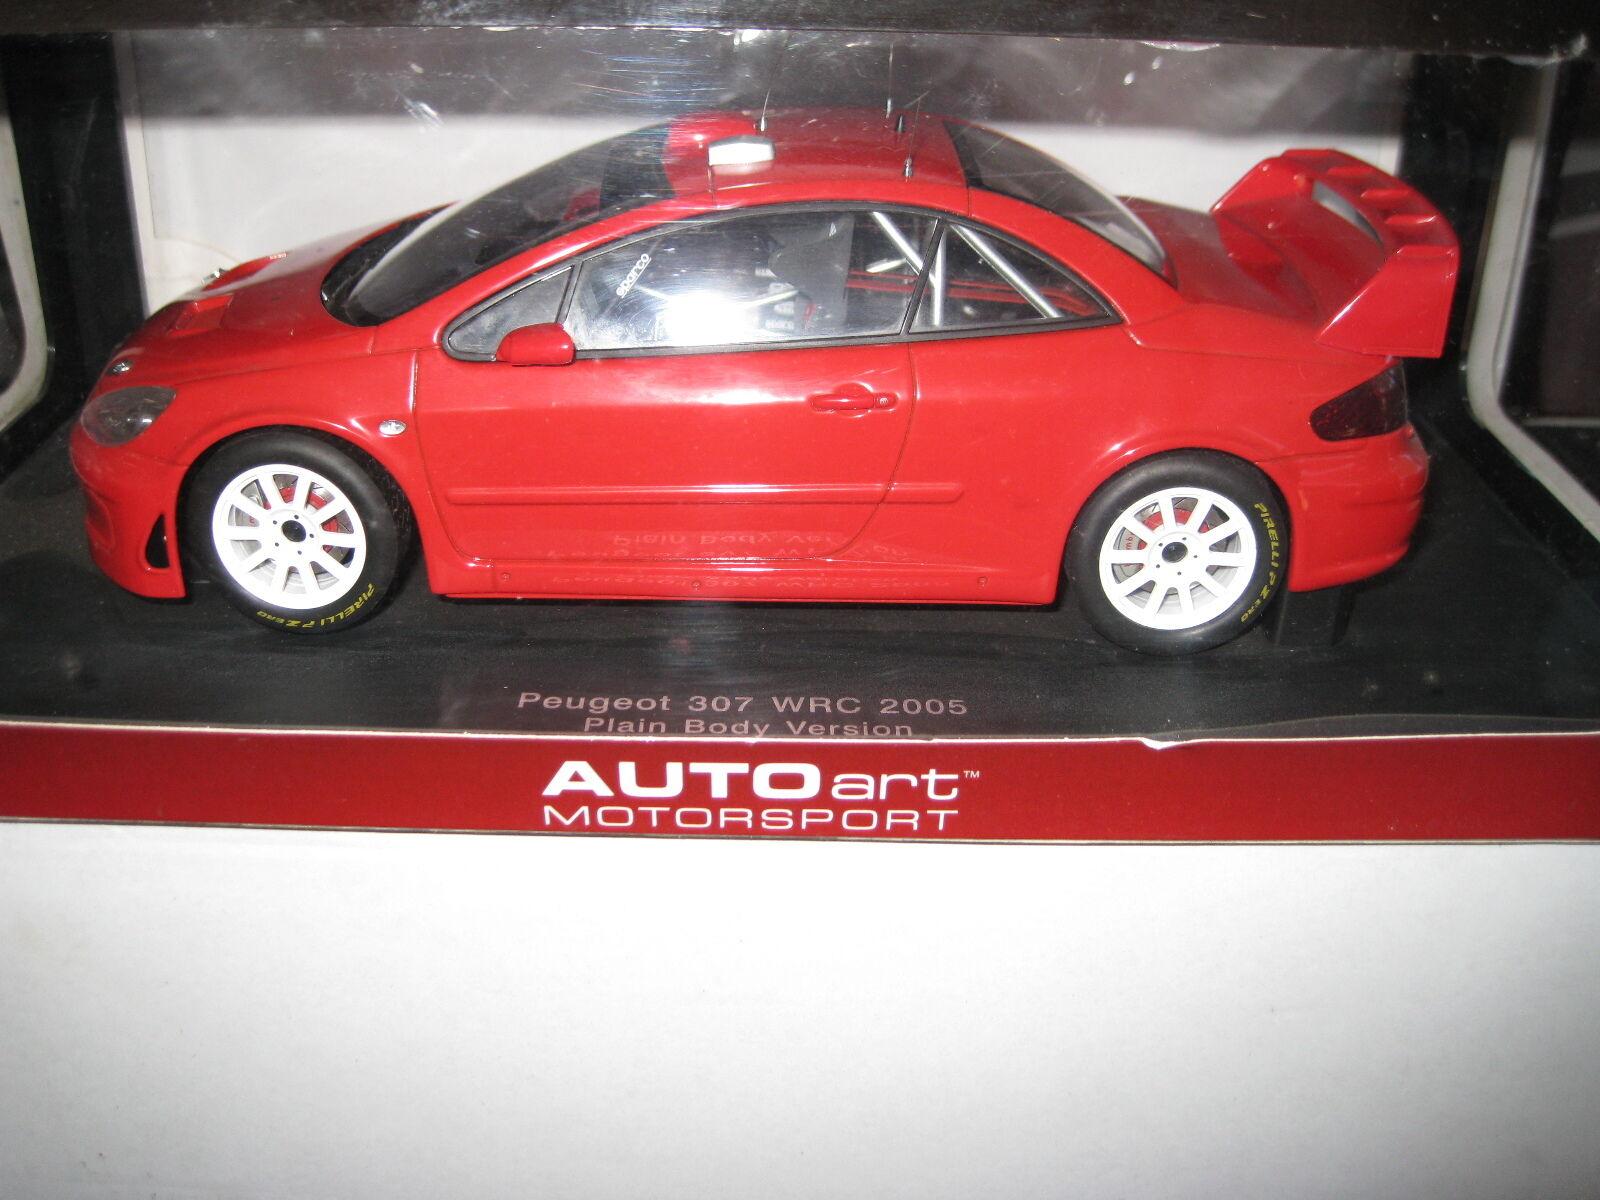 AUTOART 1.18 PEUGEOT 307 WRC 2005 PIANO verdeENZA ROSSO